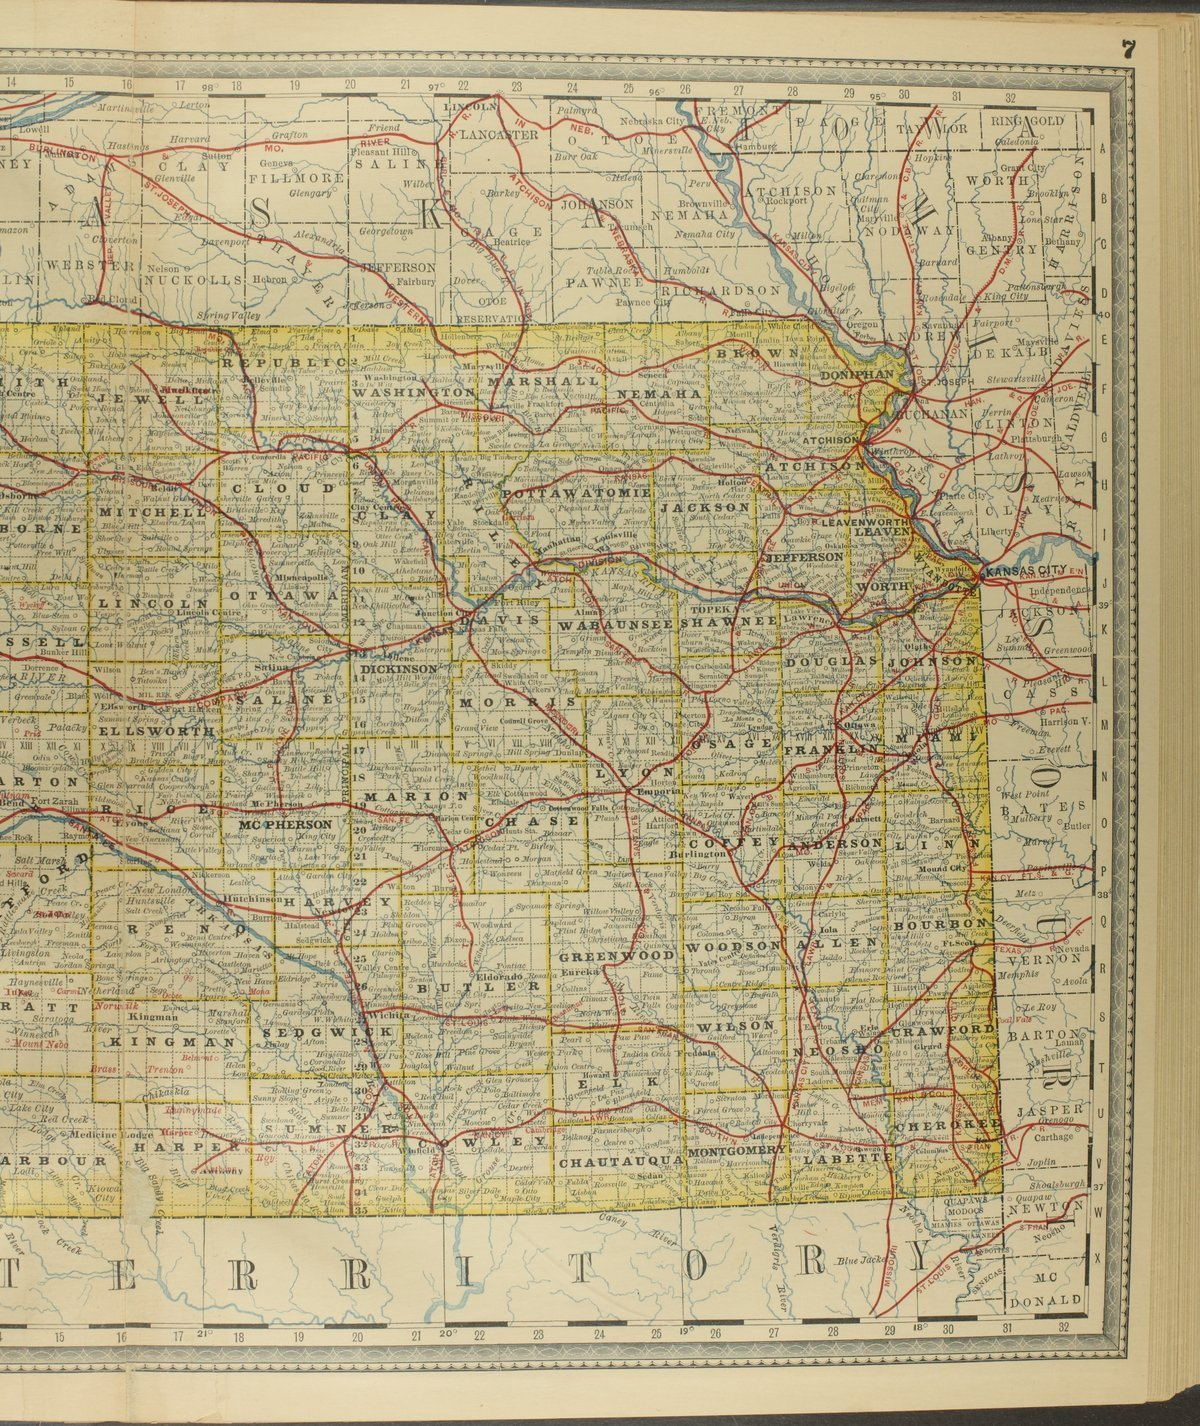 Historical plat book of Riley County, Kansas - Map of Kansas